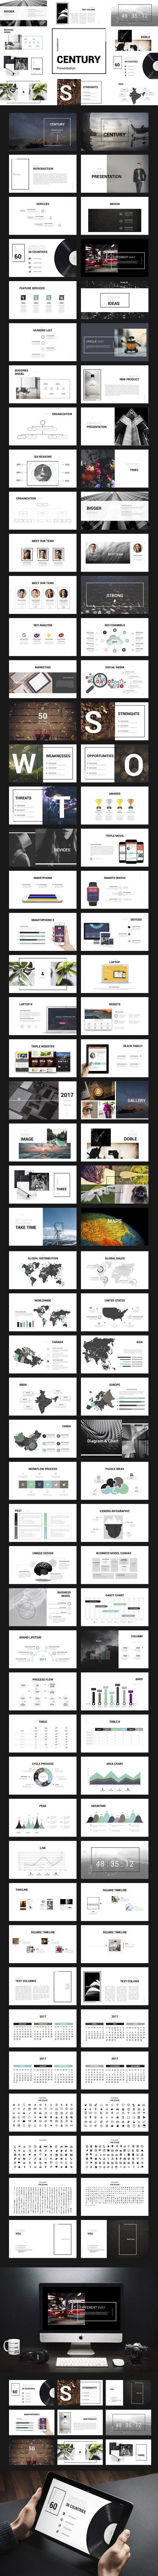 Century Powerpoint Template. Presentation Templates